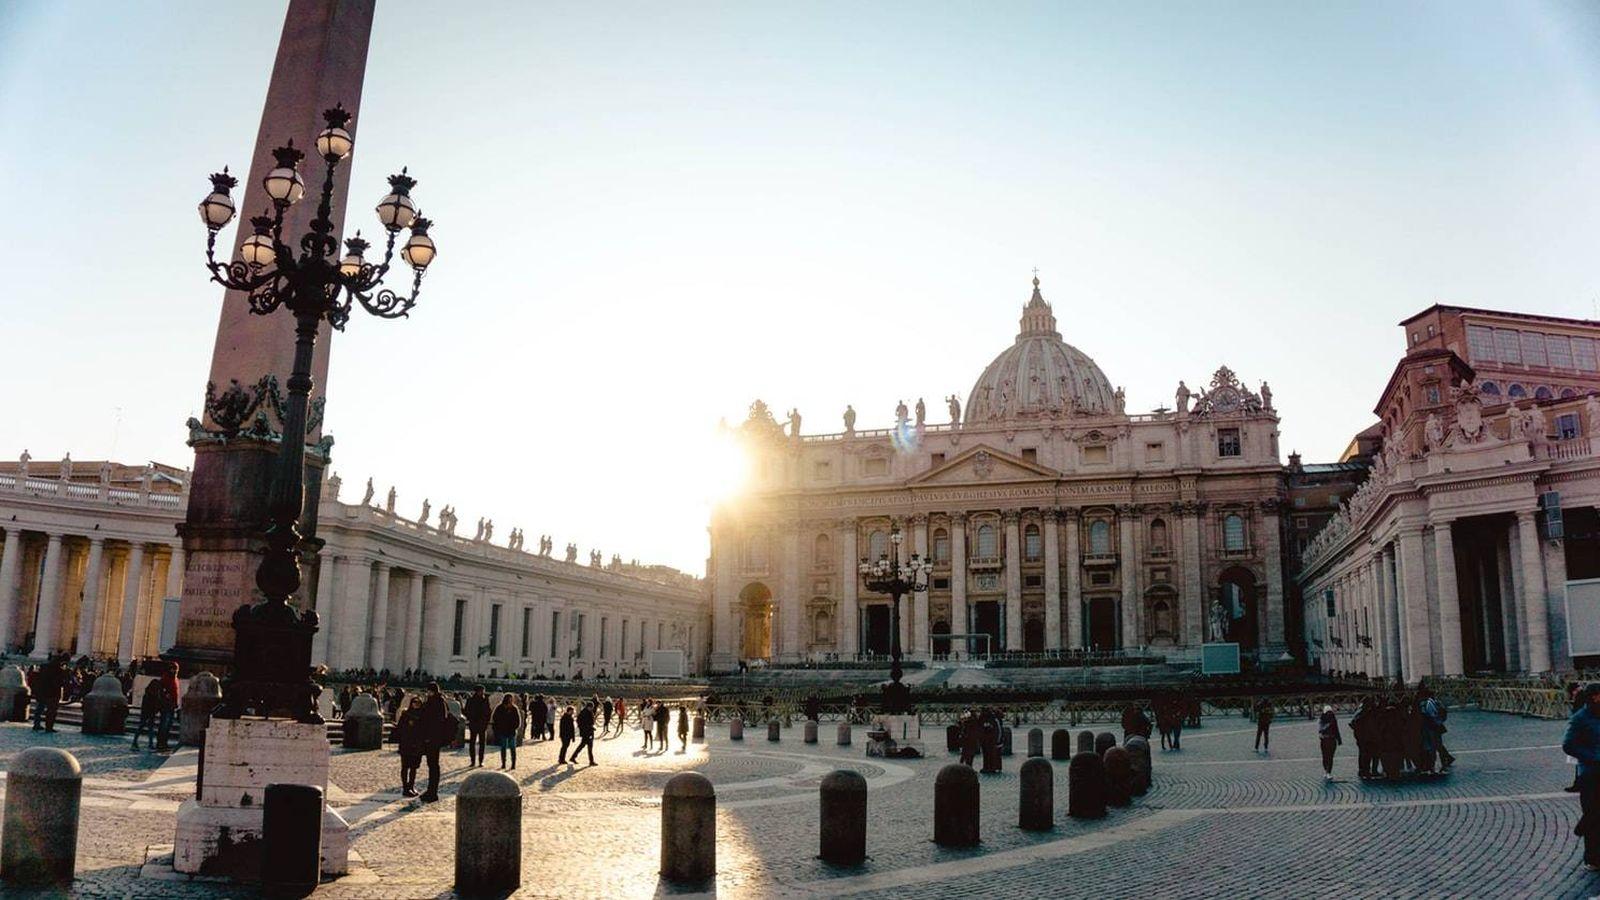 Foto: El Vaticano (Yeo Khee/Unsplash)